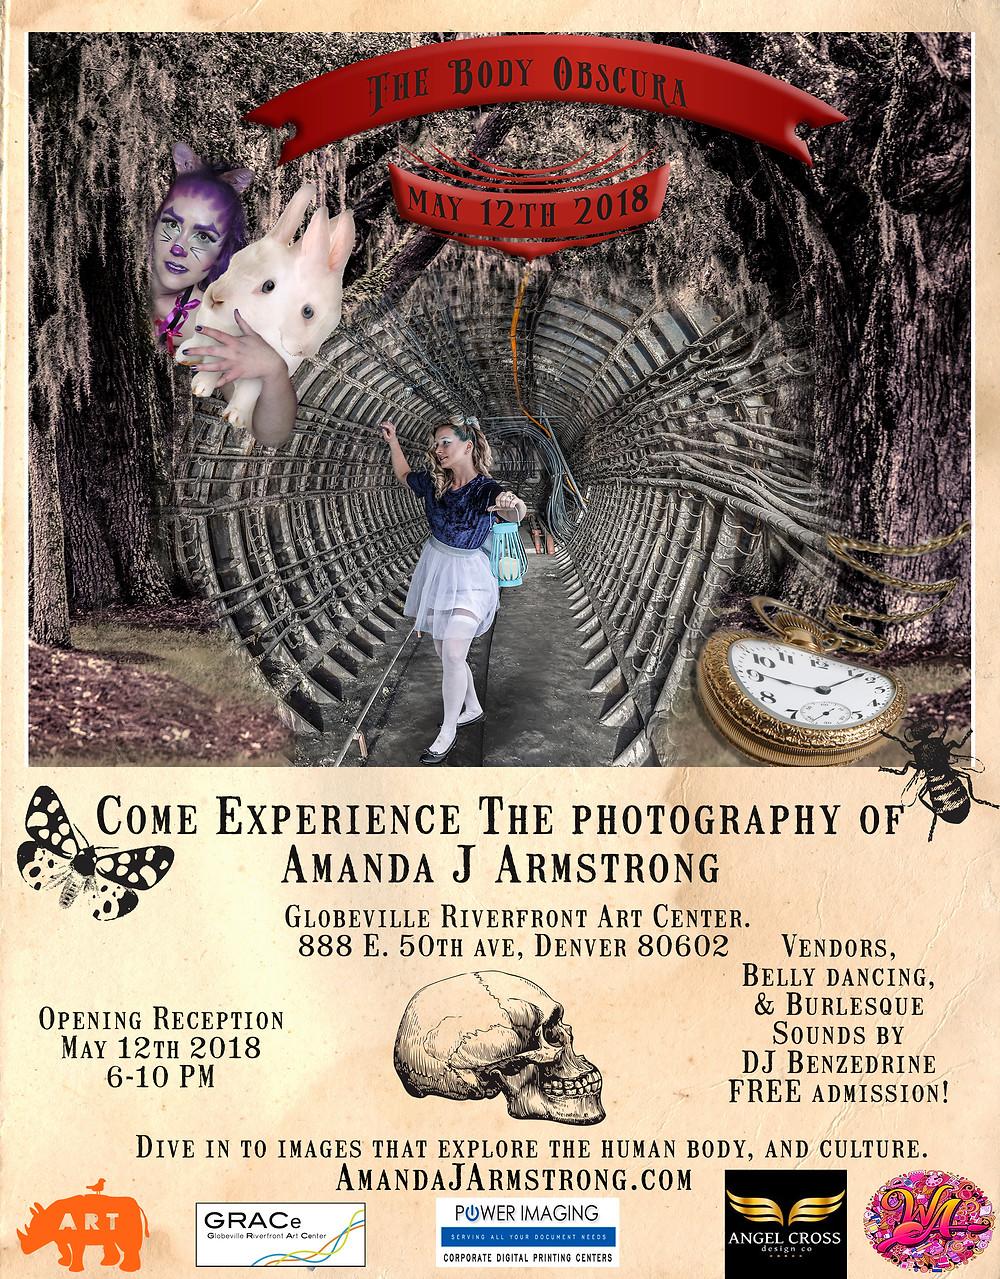 the body obscura, art show, photography, surreal, amanda j armstrong, denver, art, colorado, GRACe, Rino district